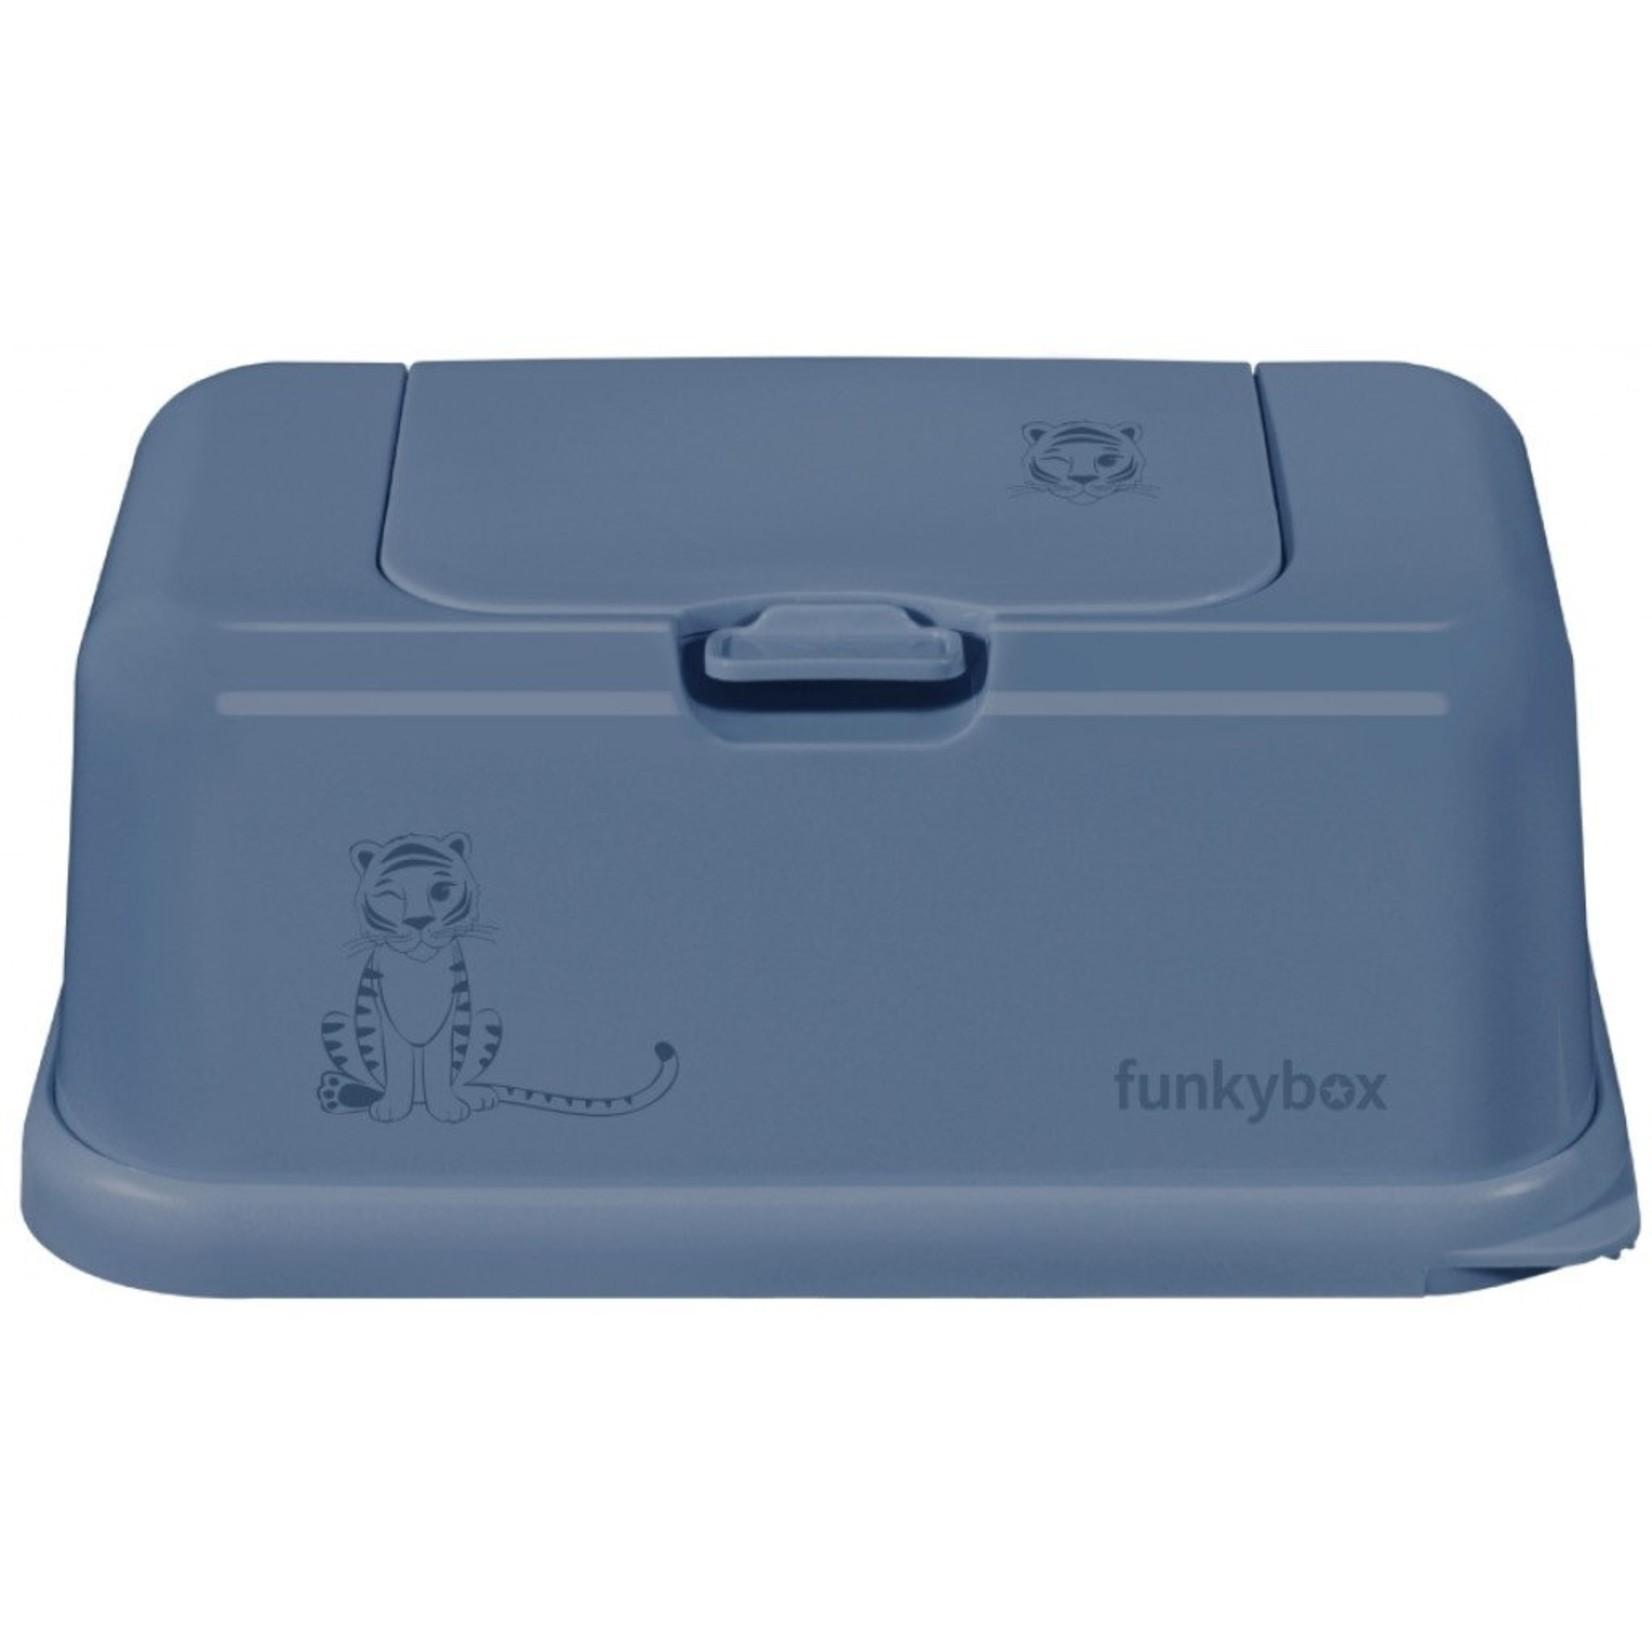 Funkybox Funkybox Jeans blue Tiger